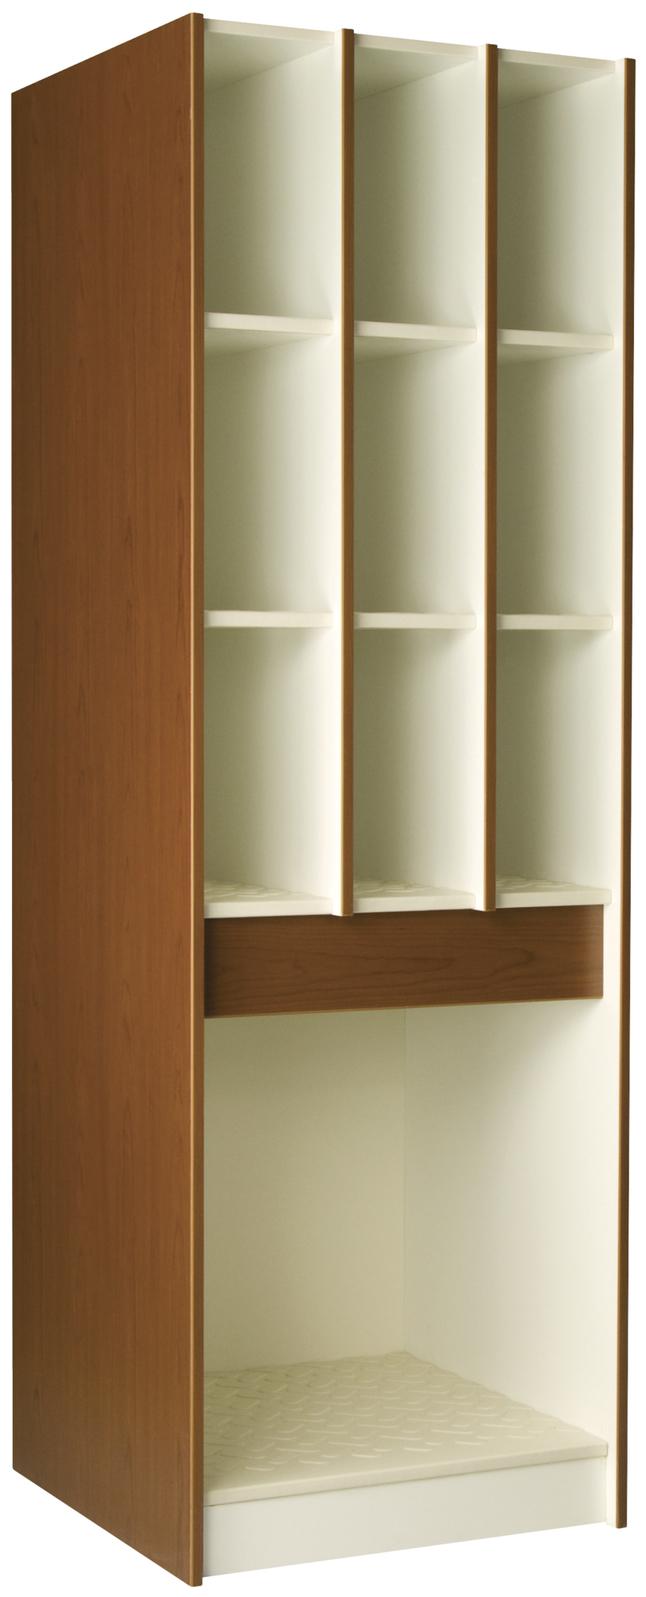 Instrument Storage, Item Number 1367409